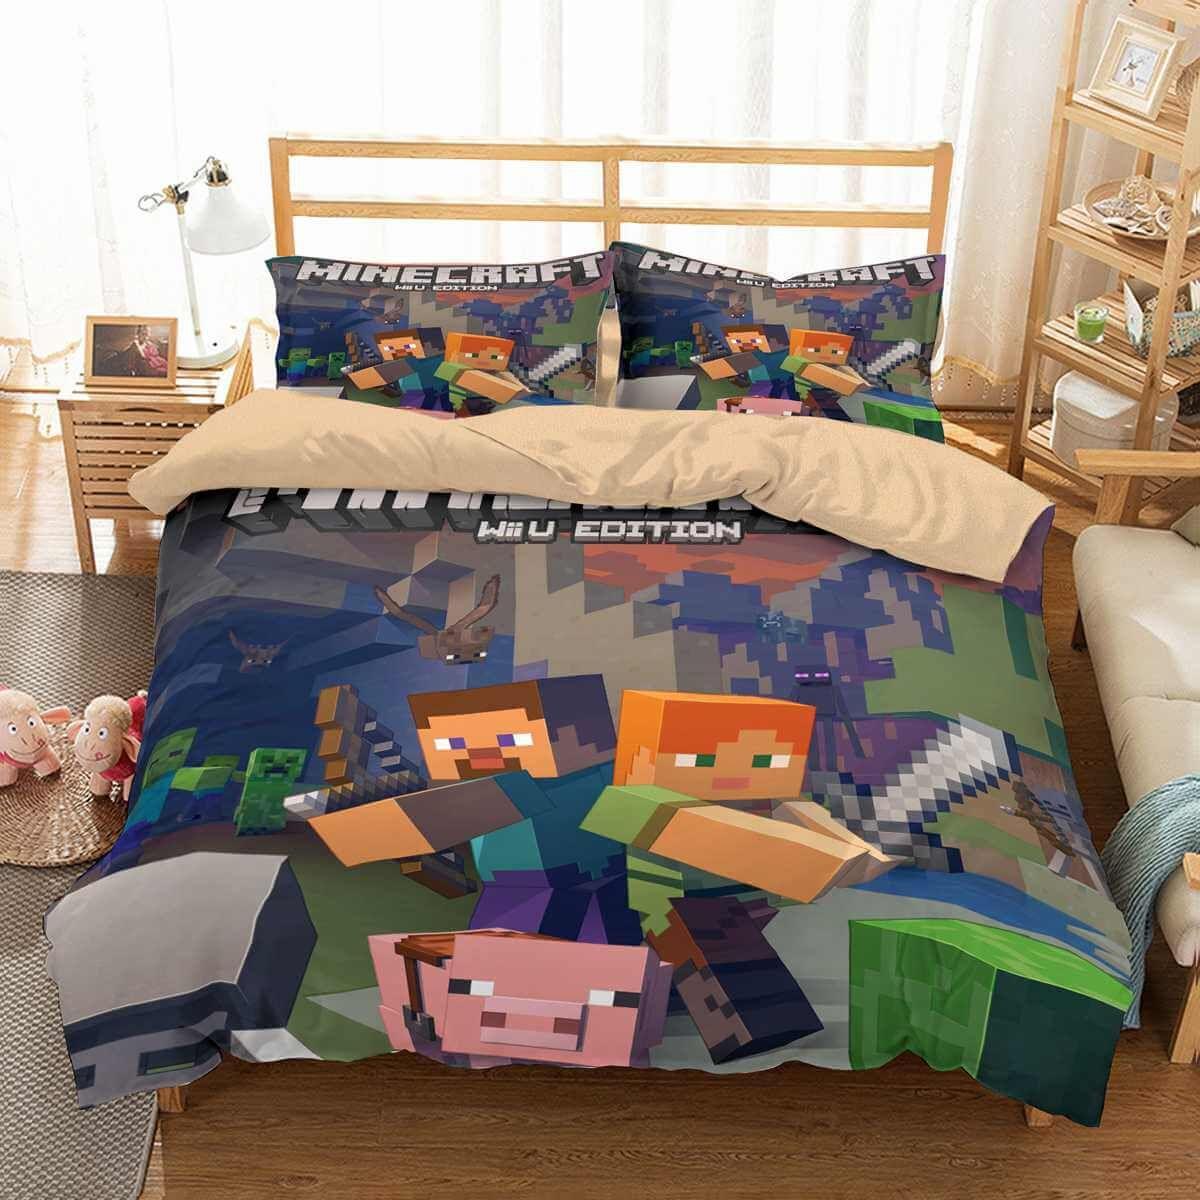 3D Customize Minecraft Bedding Set Duvet Cover Set Bedroom